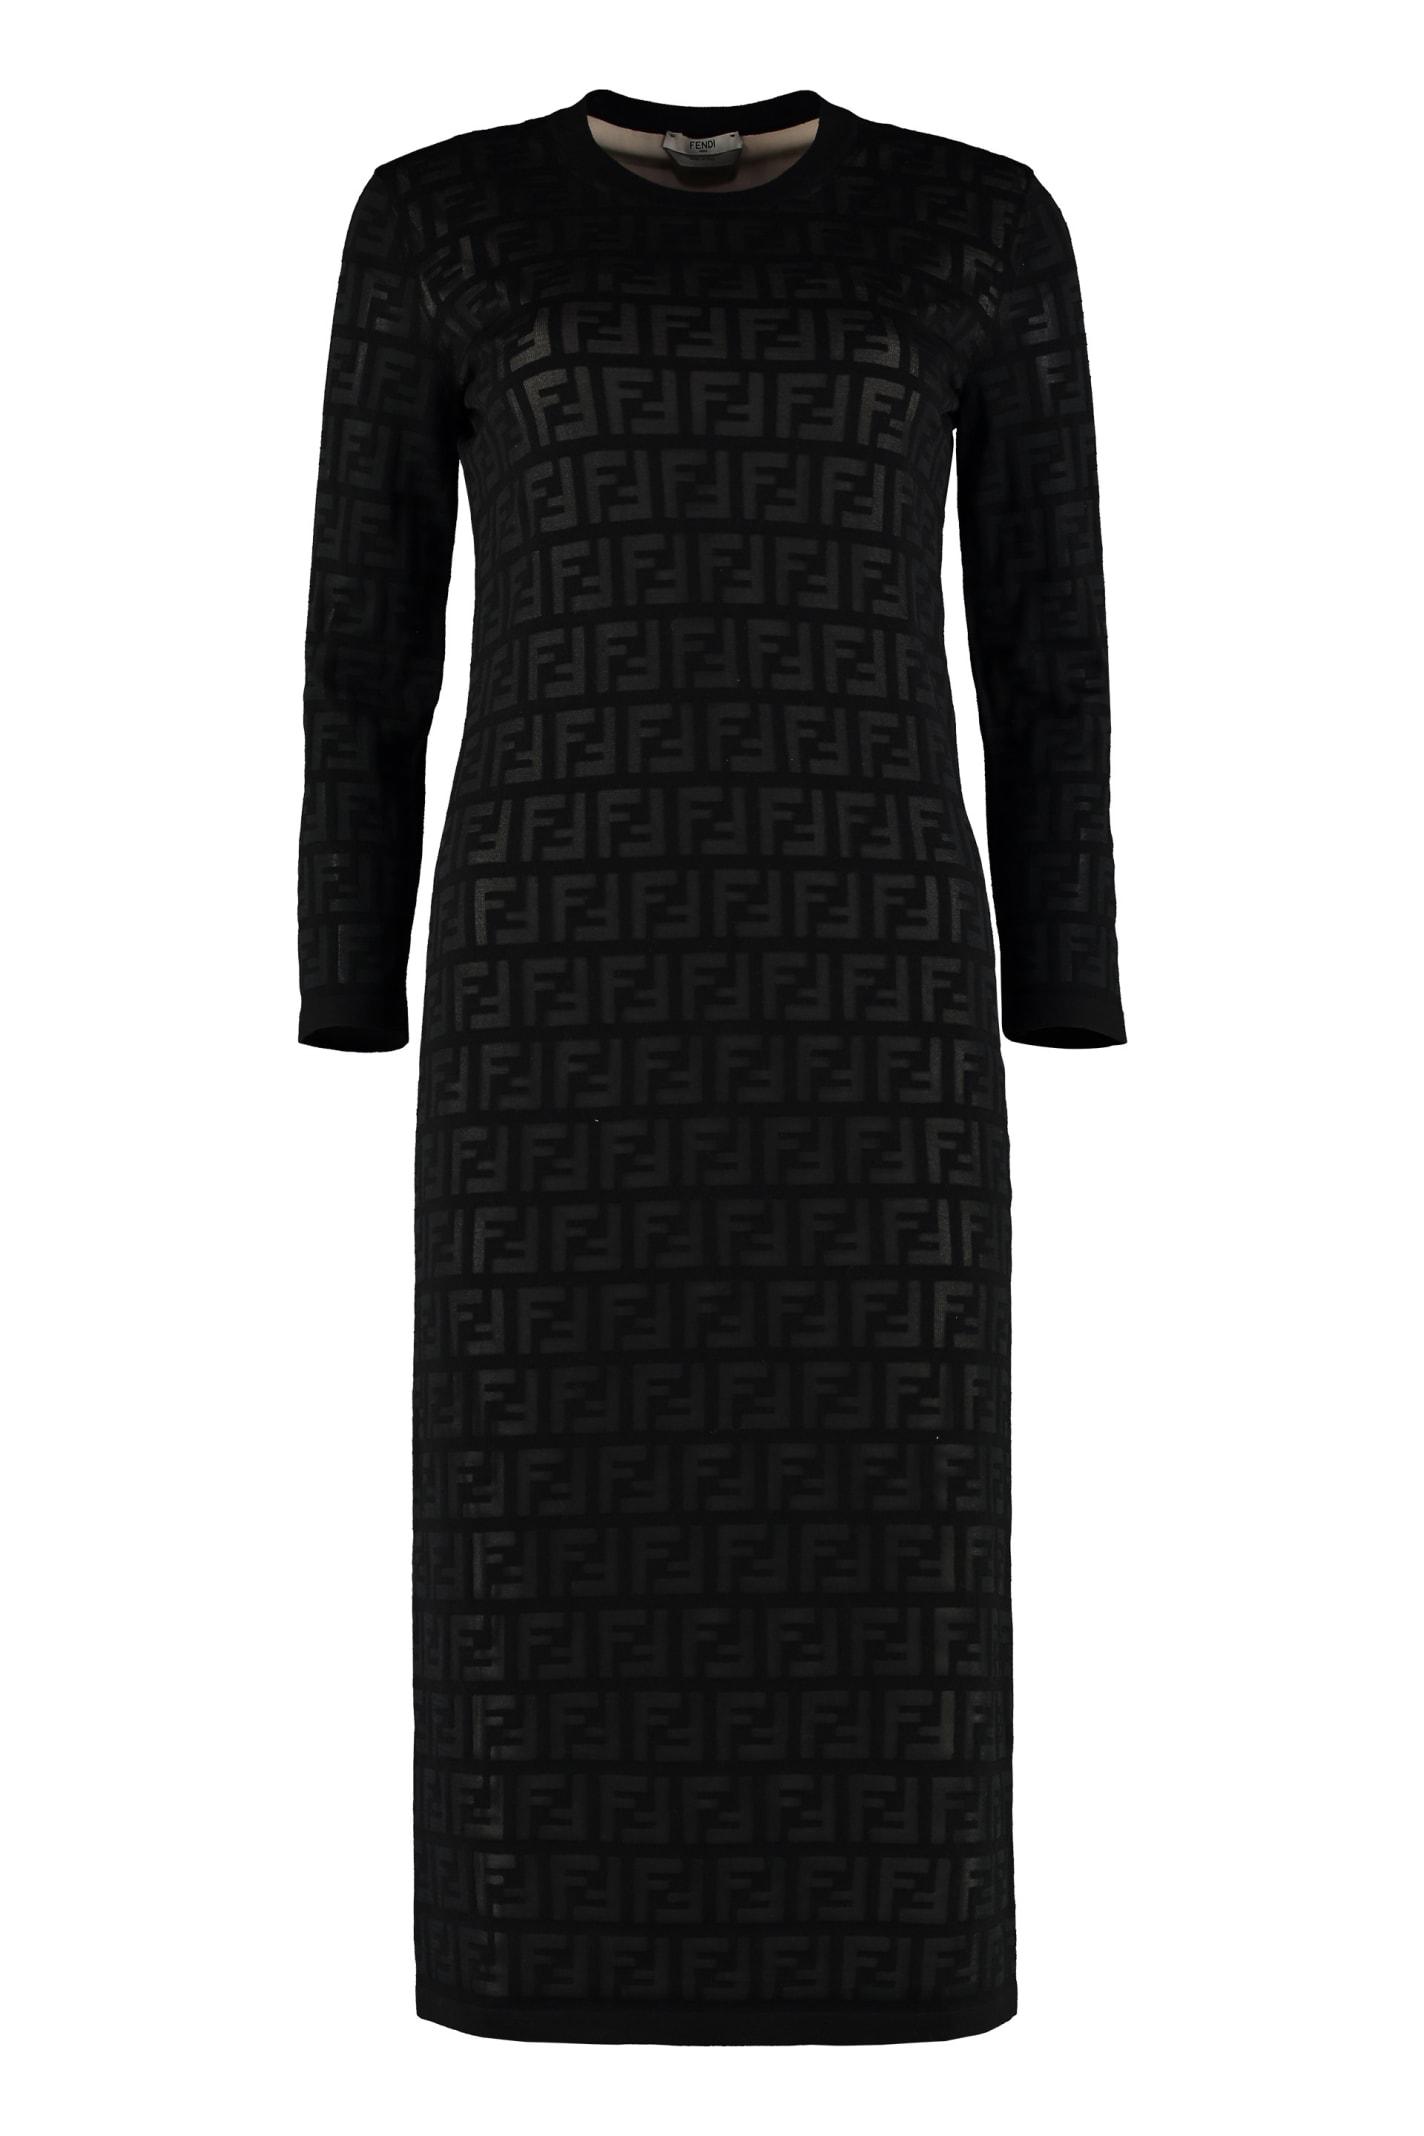 Buy Fendi Knitted Sheath Dress online, shop Fendi with free shipping